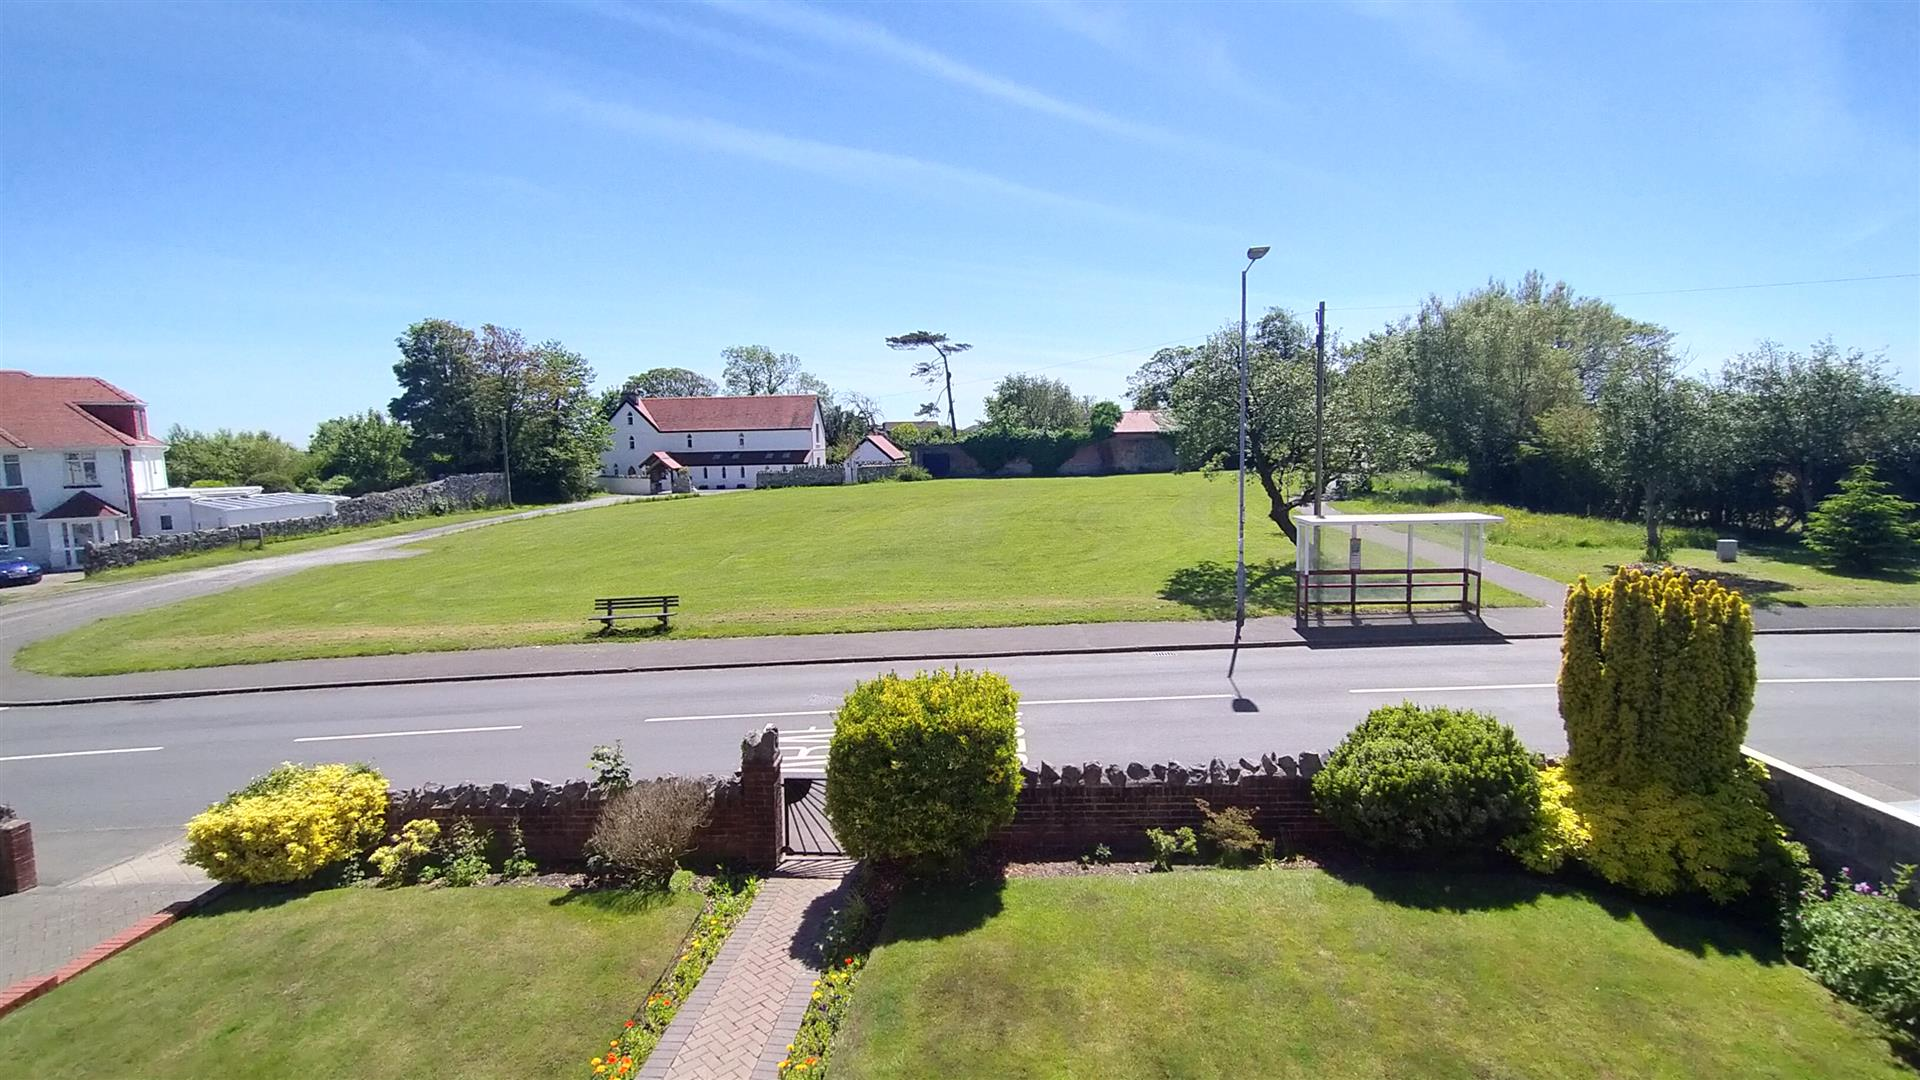 Murton Lane, Newton, Mumbles, Swansea, SA3 4TR